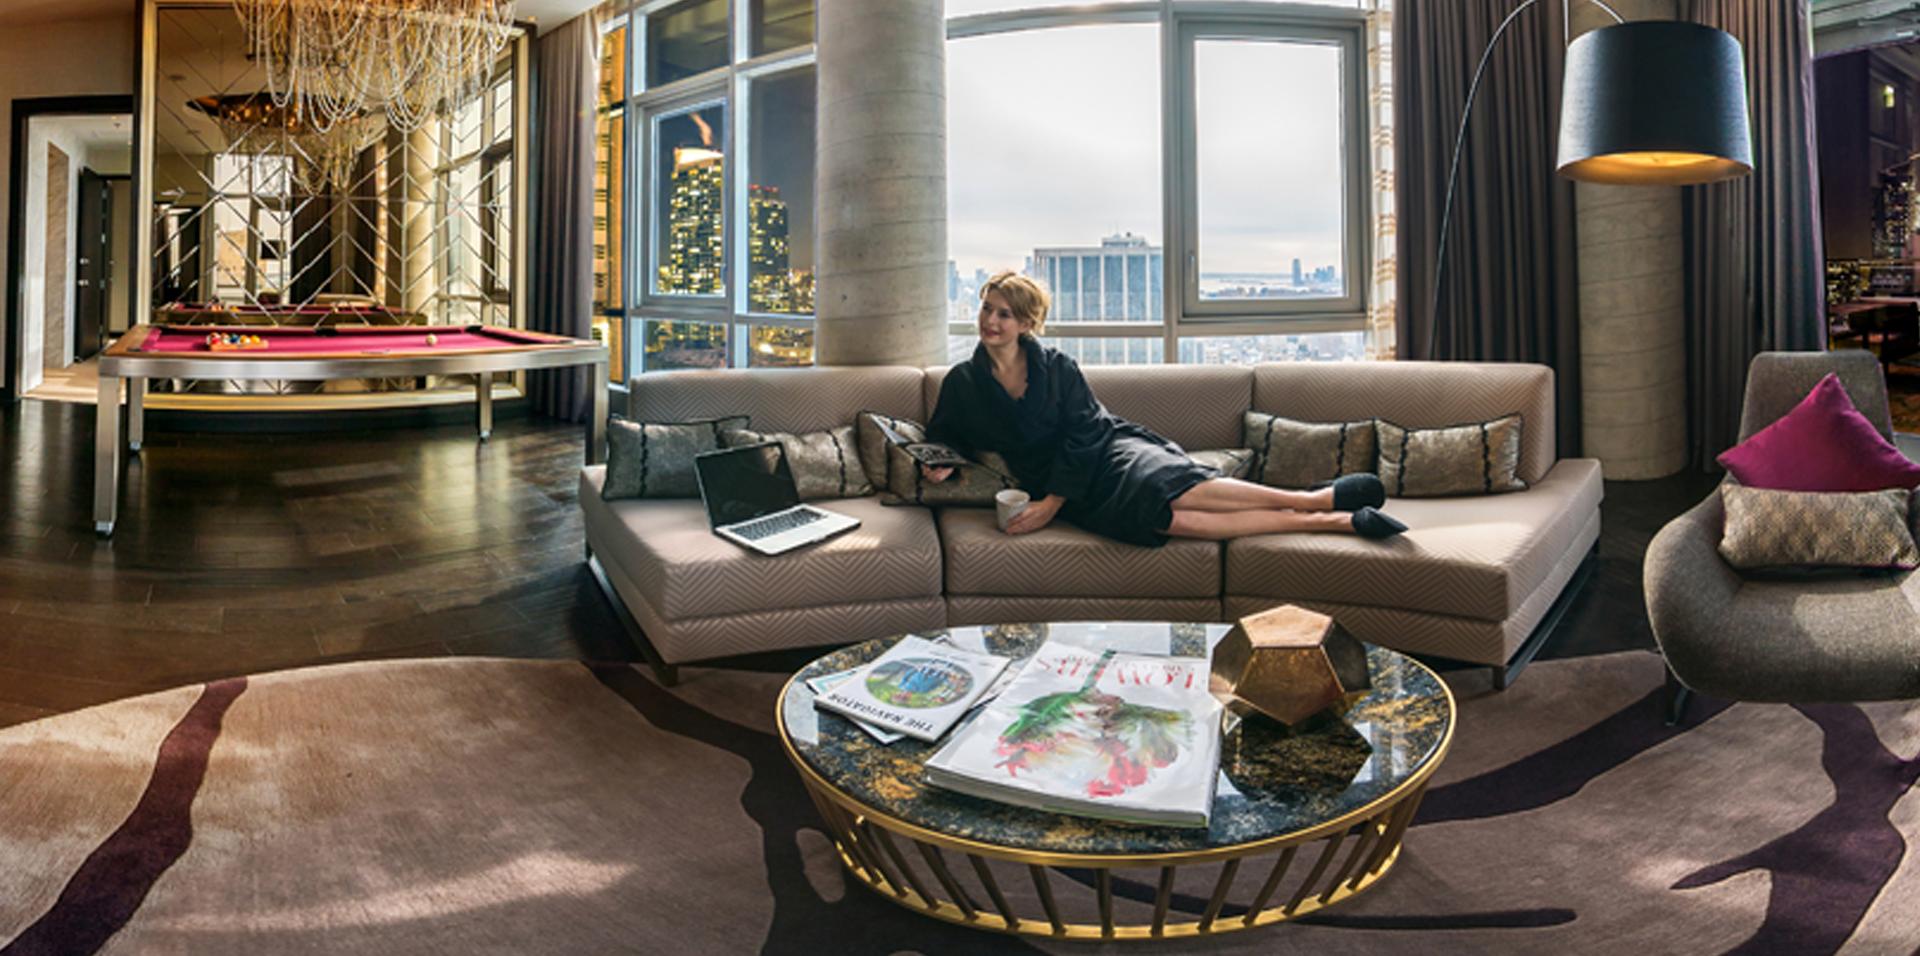 Convert visitors into hotel guests